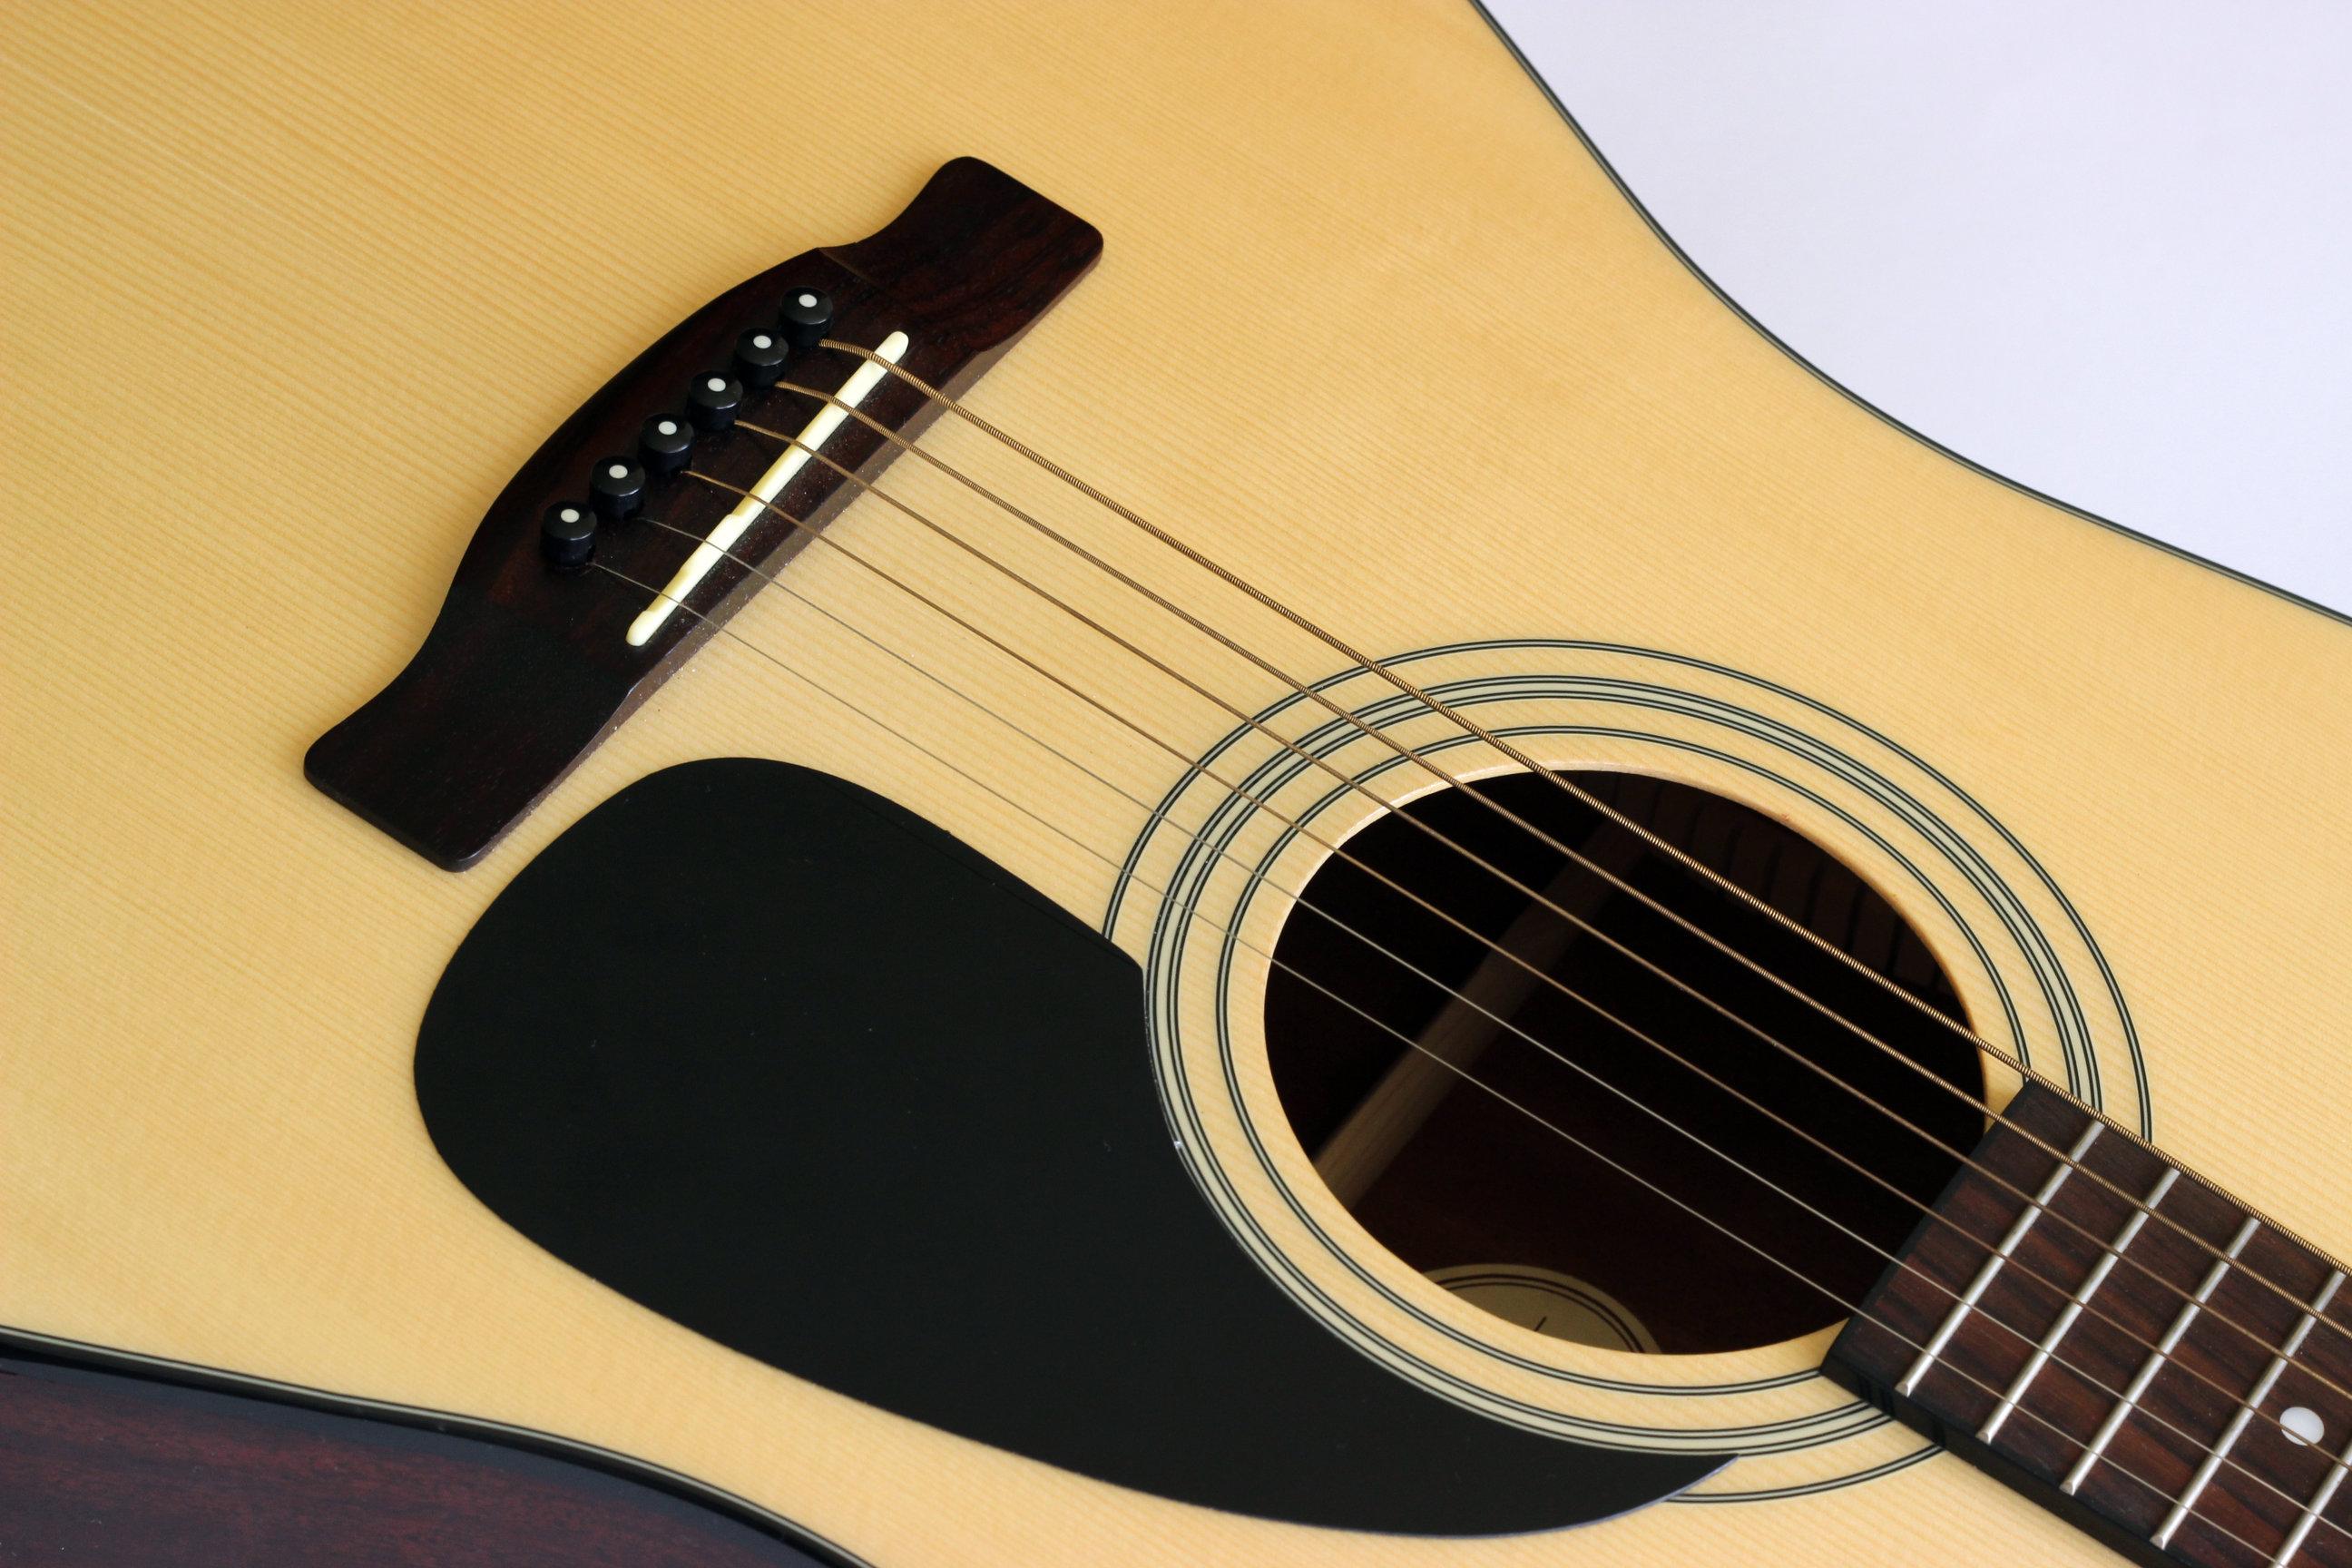 Magic Bullet For Learning Guitar Easily